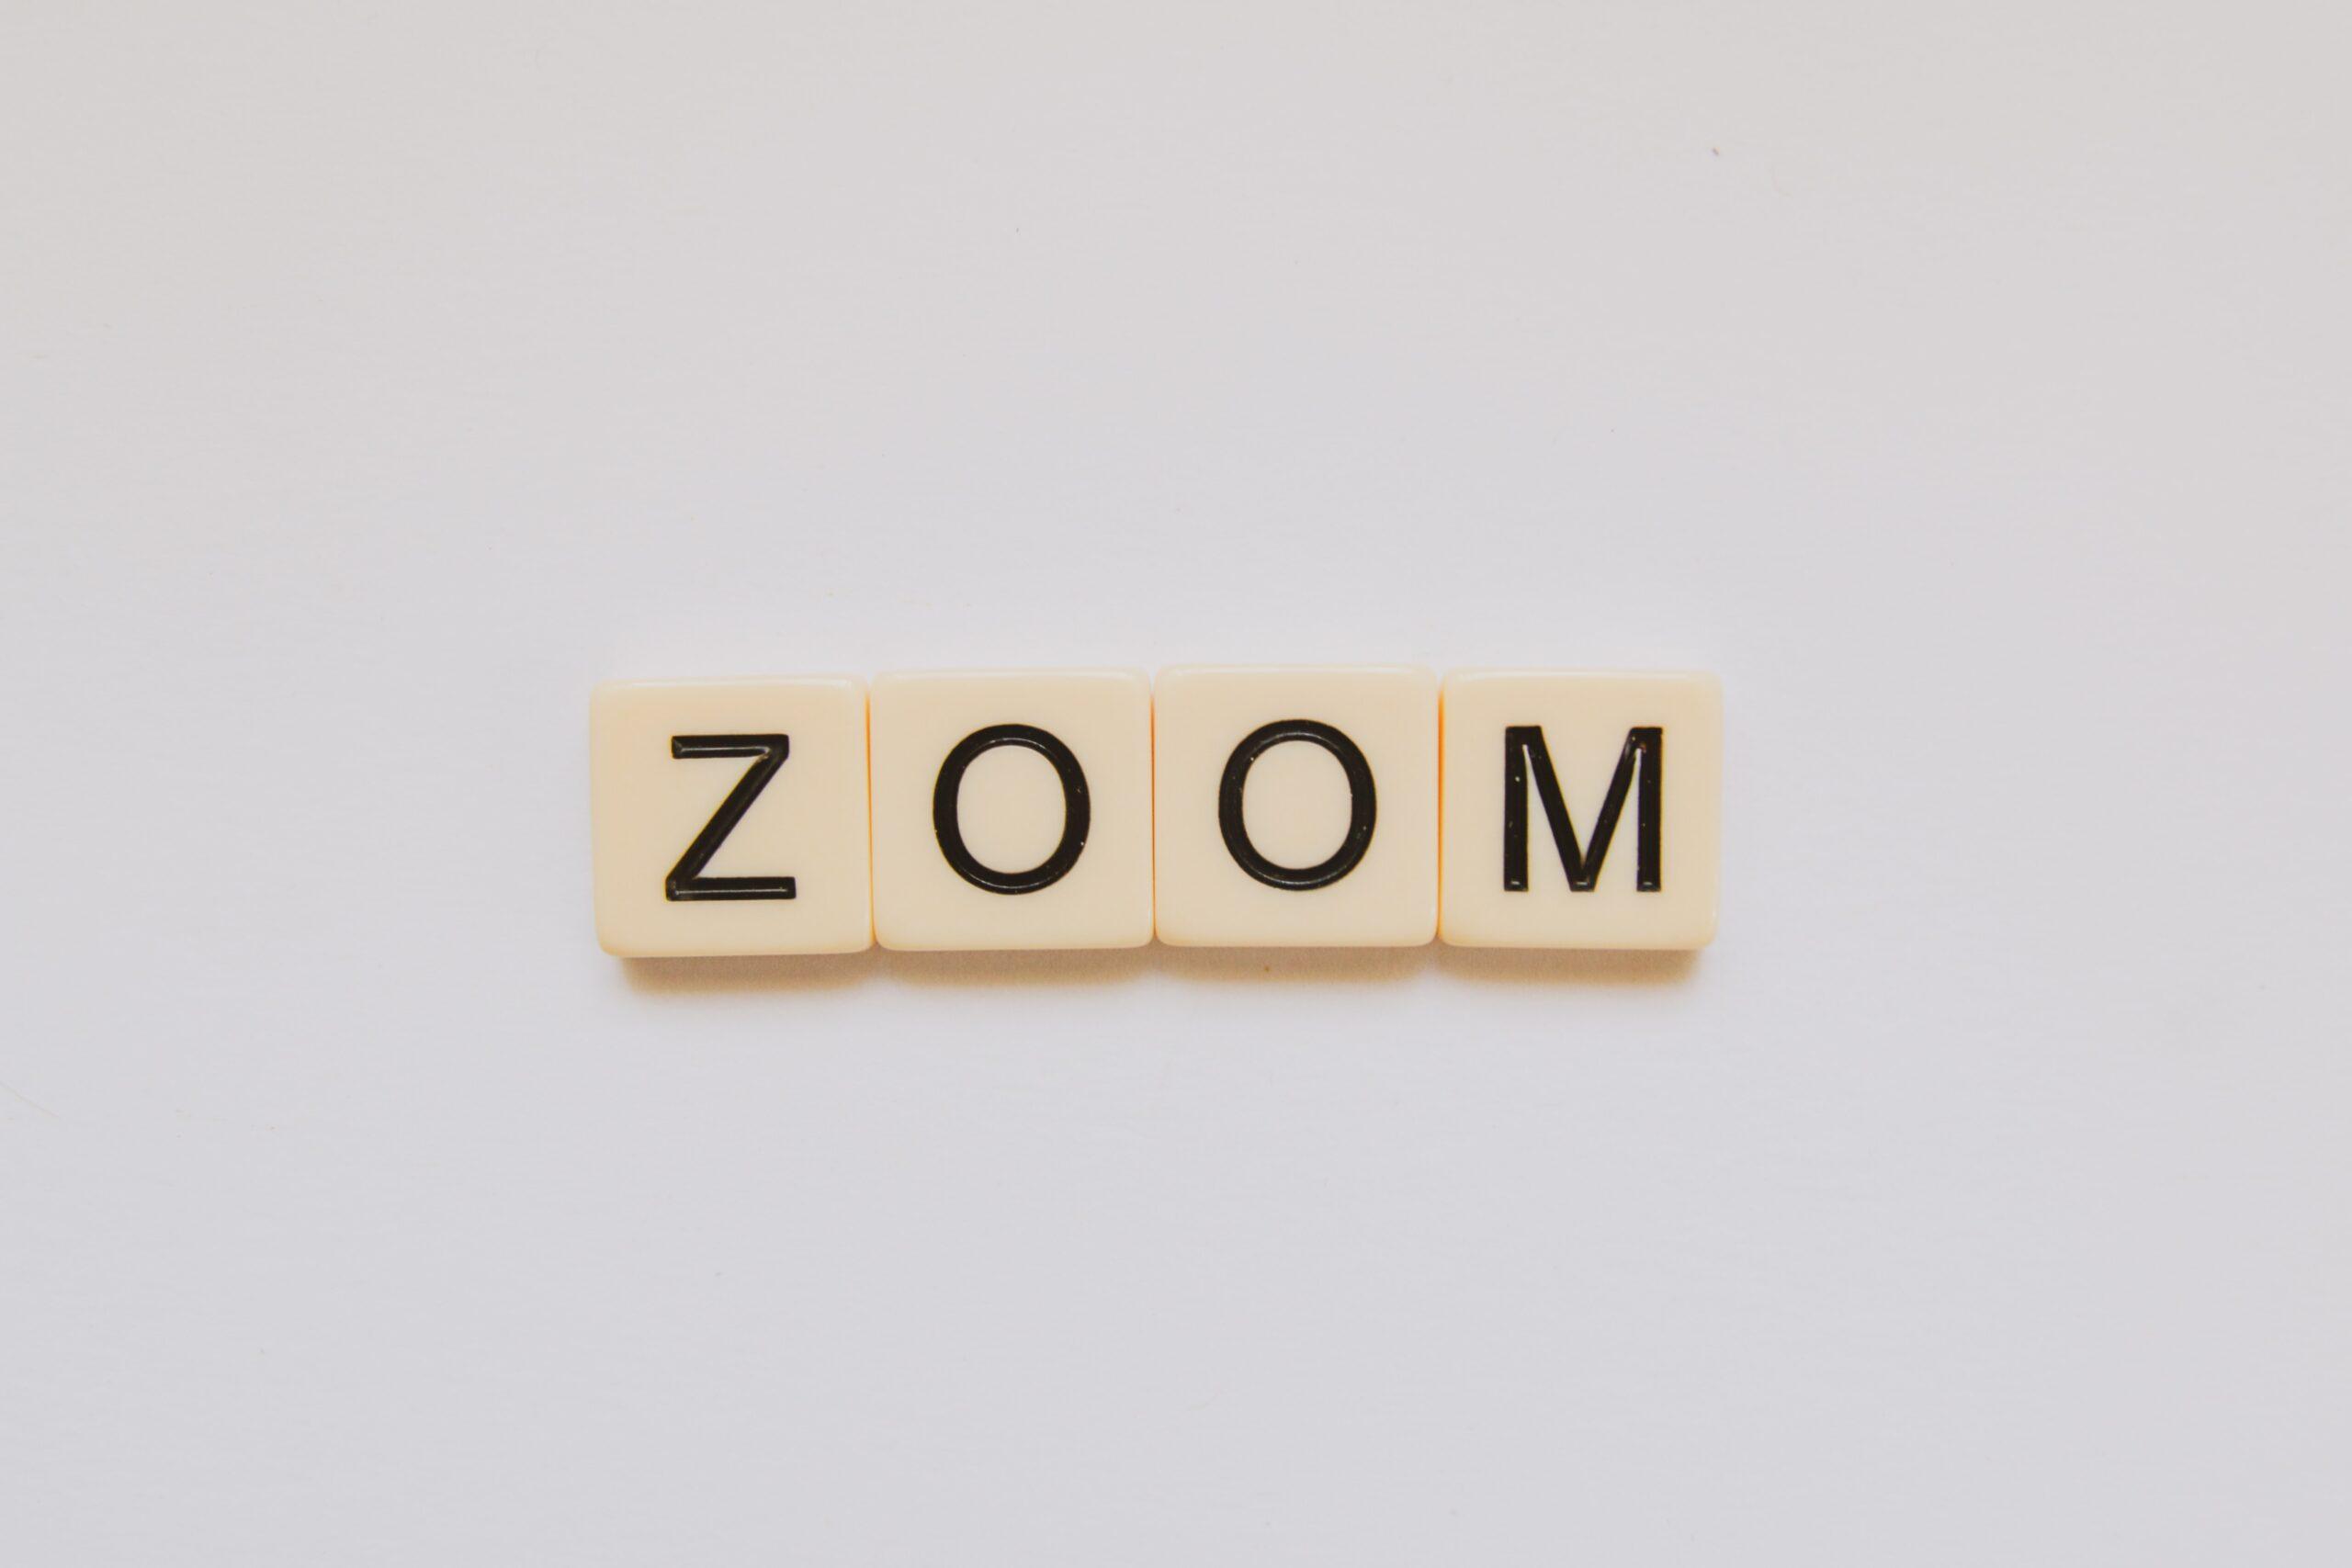 Zoomが嫌い、疲れる理由…オンラインミーティングではなぜ疲れるのか?